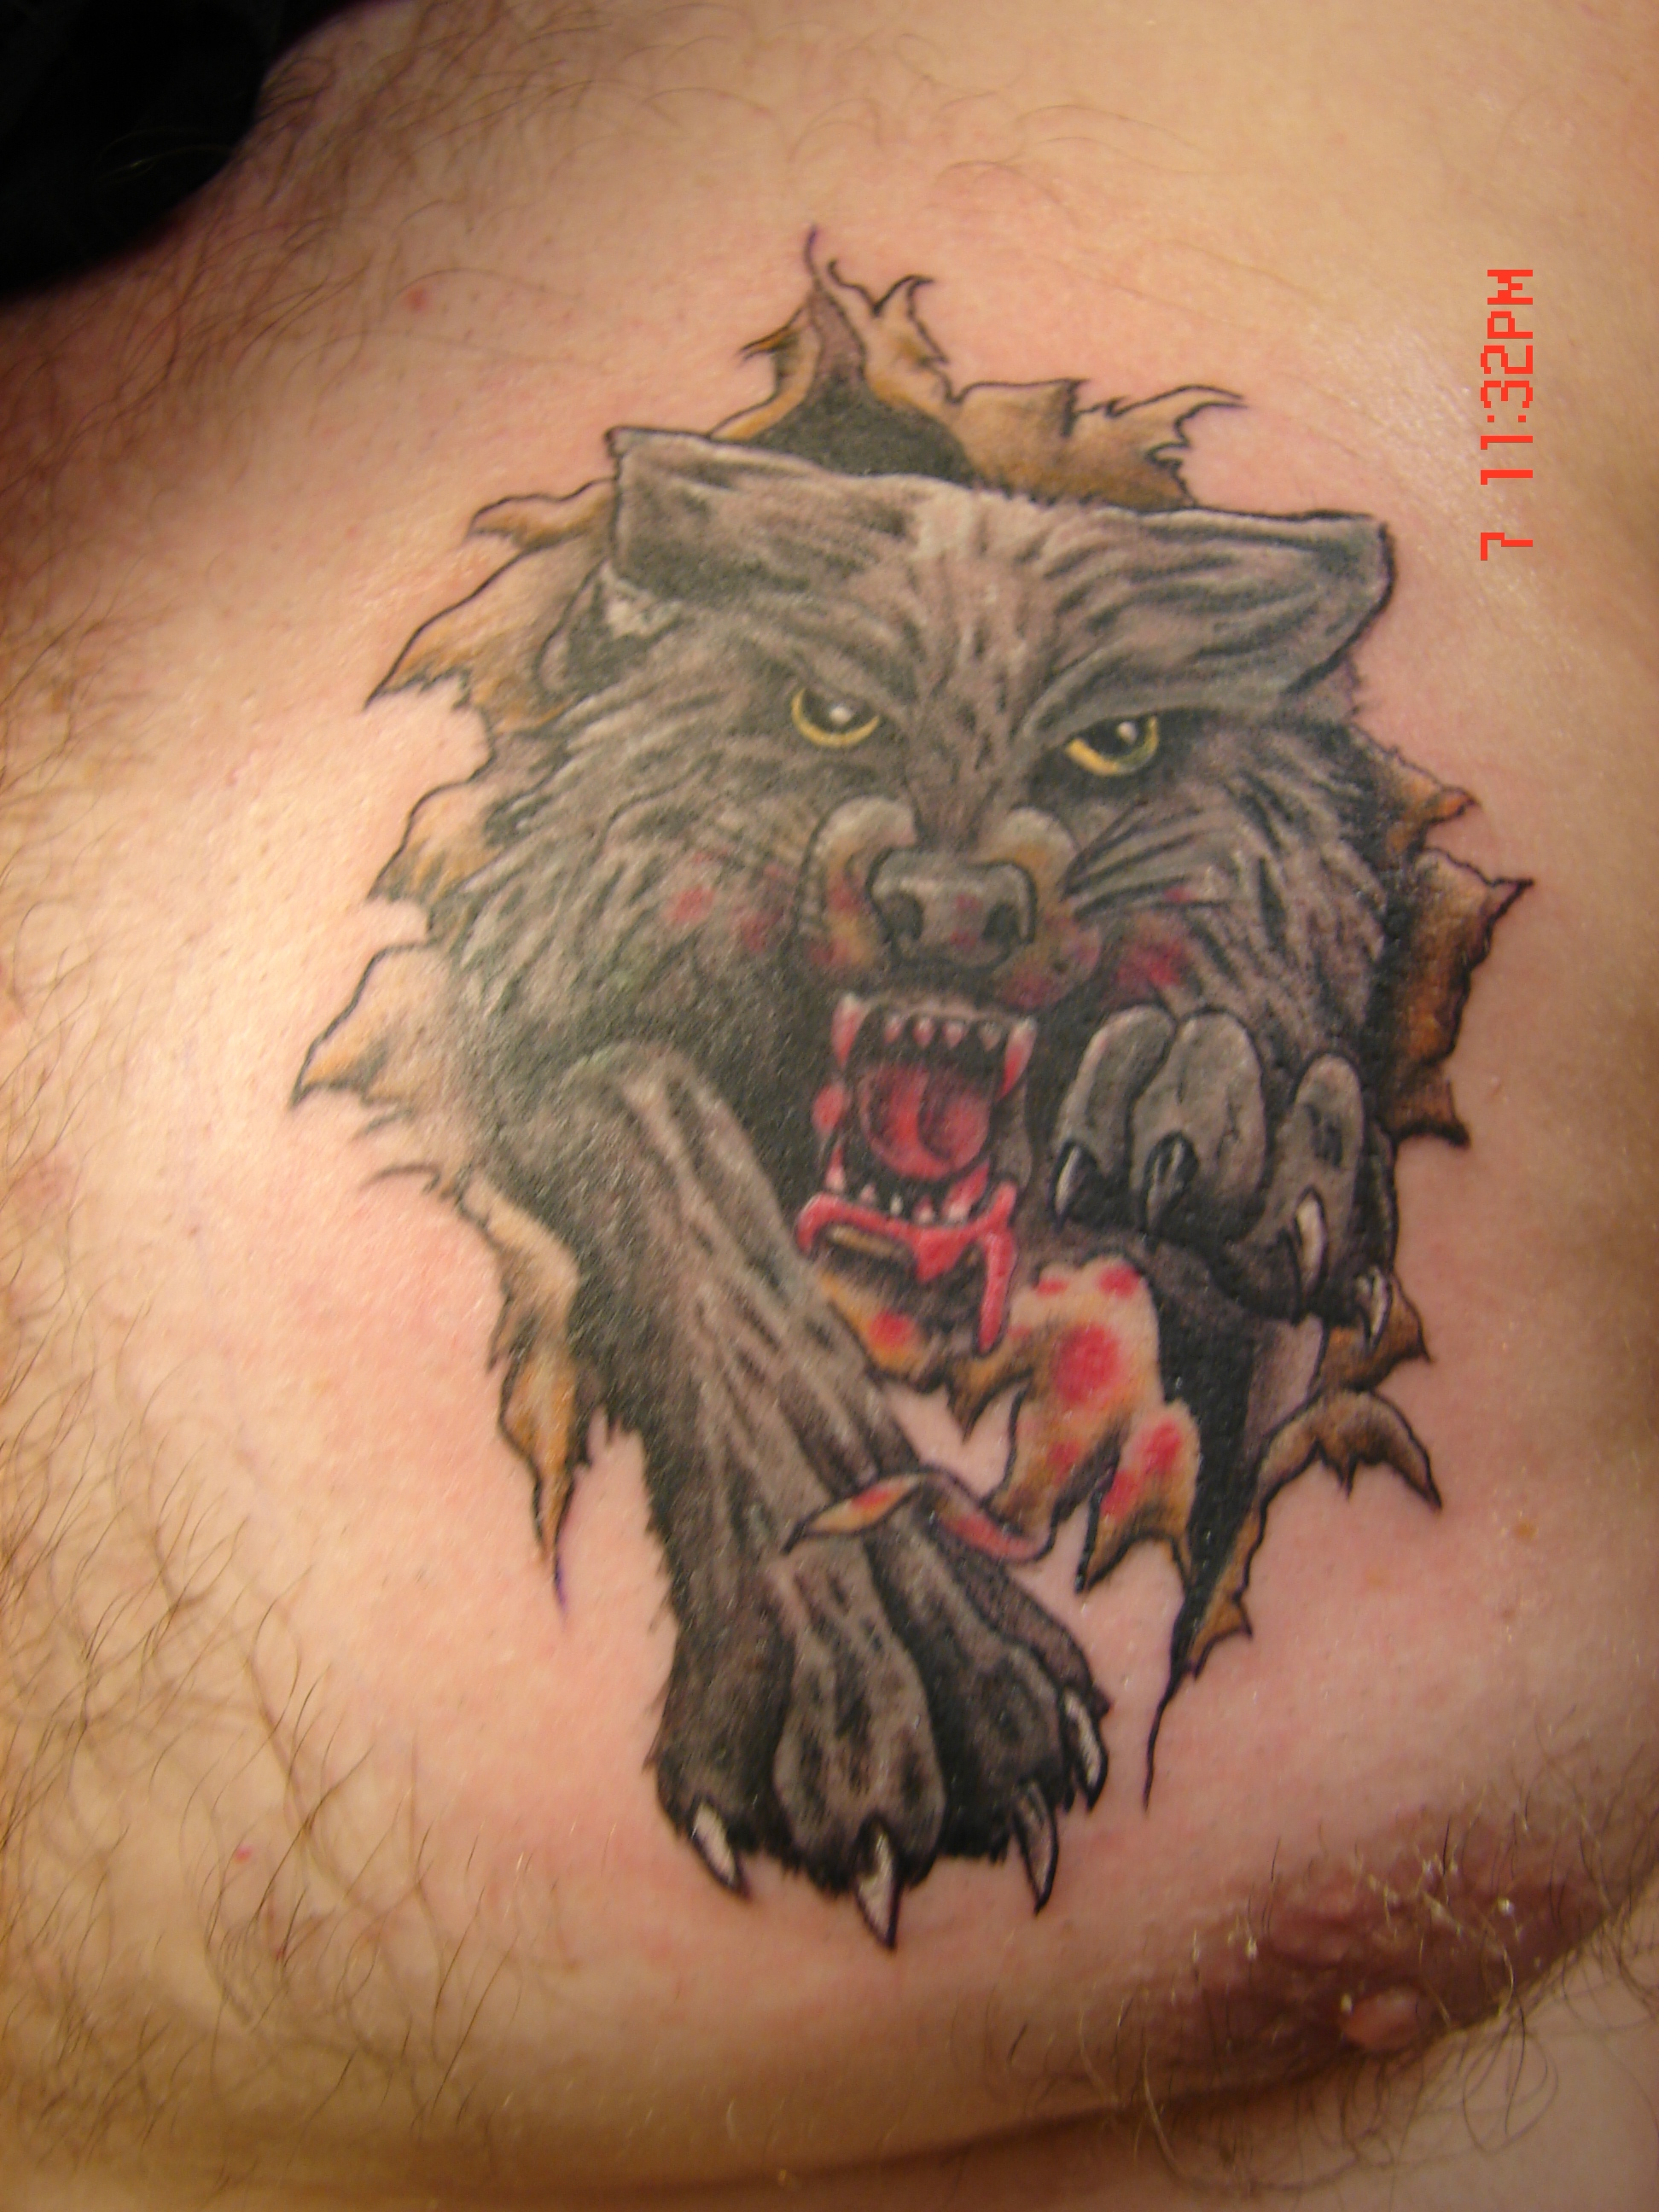 Small Dragon Chest Tattoo Tattoo Design Contest